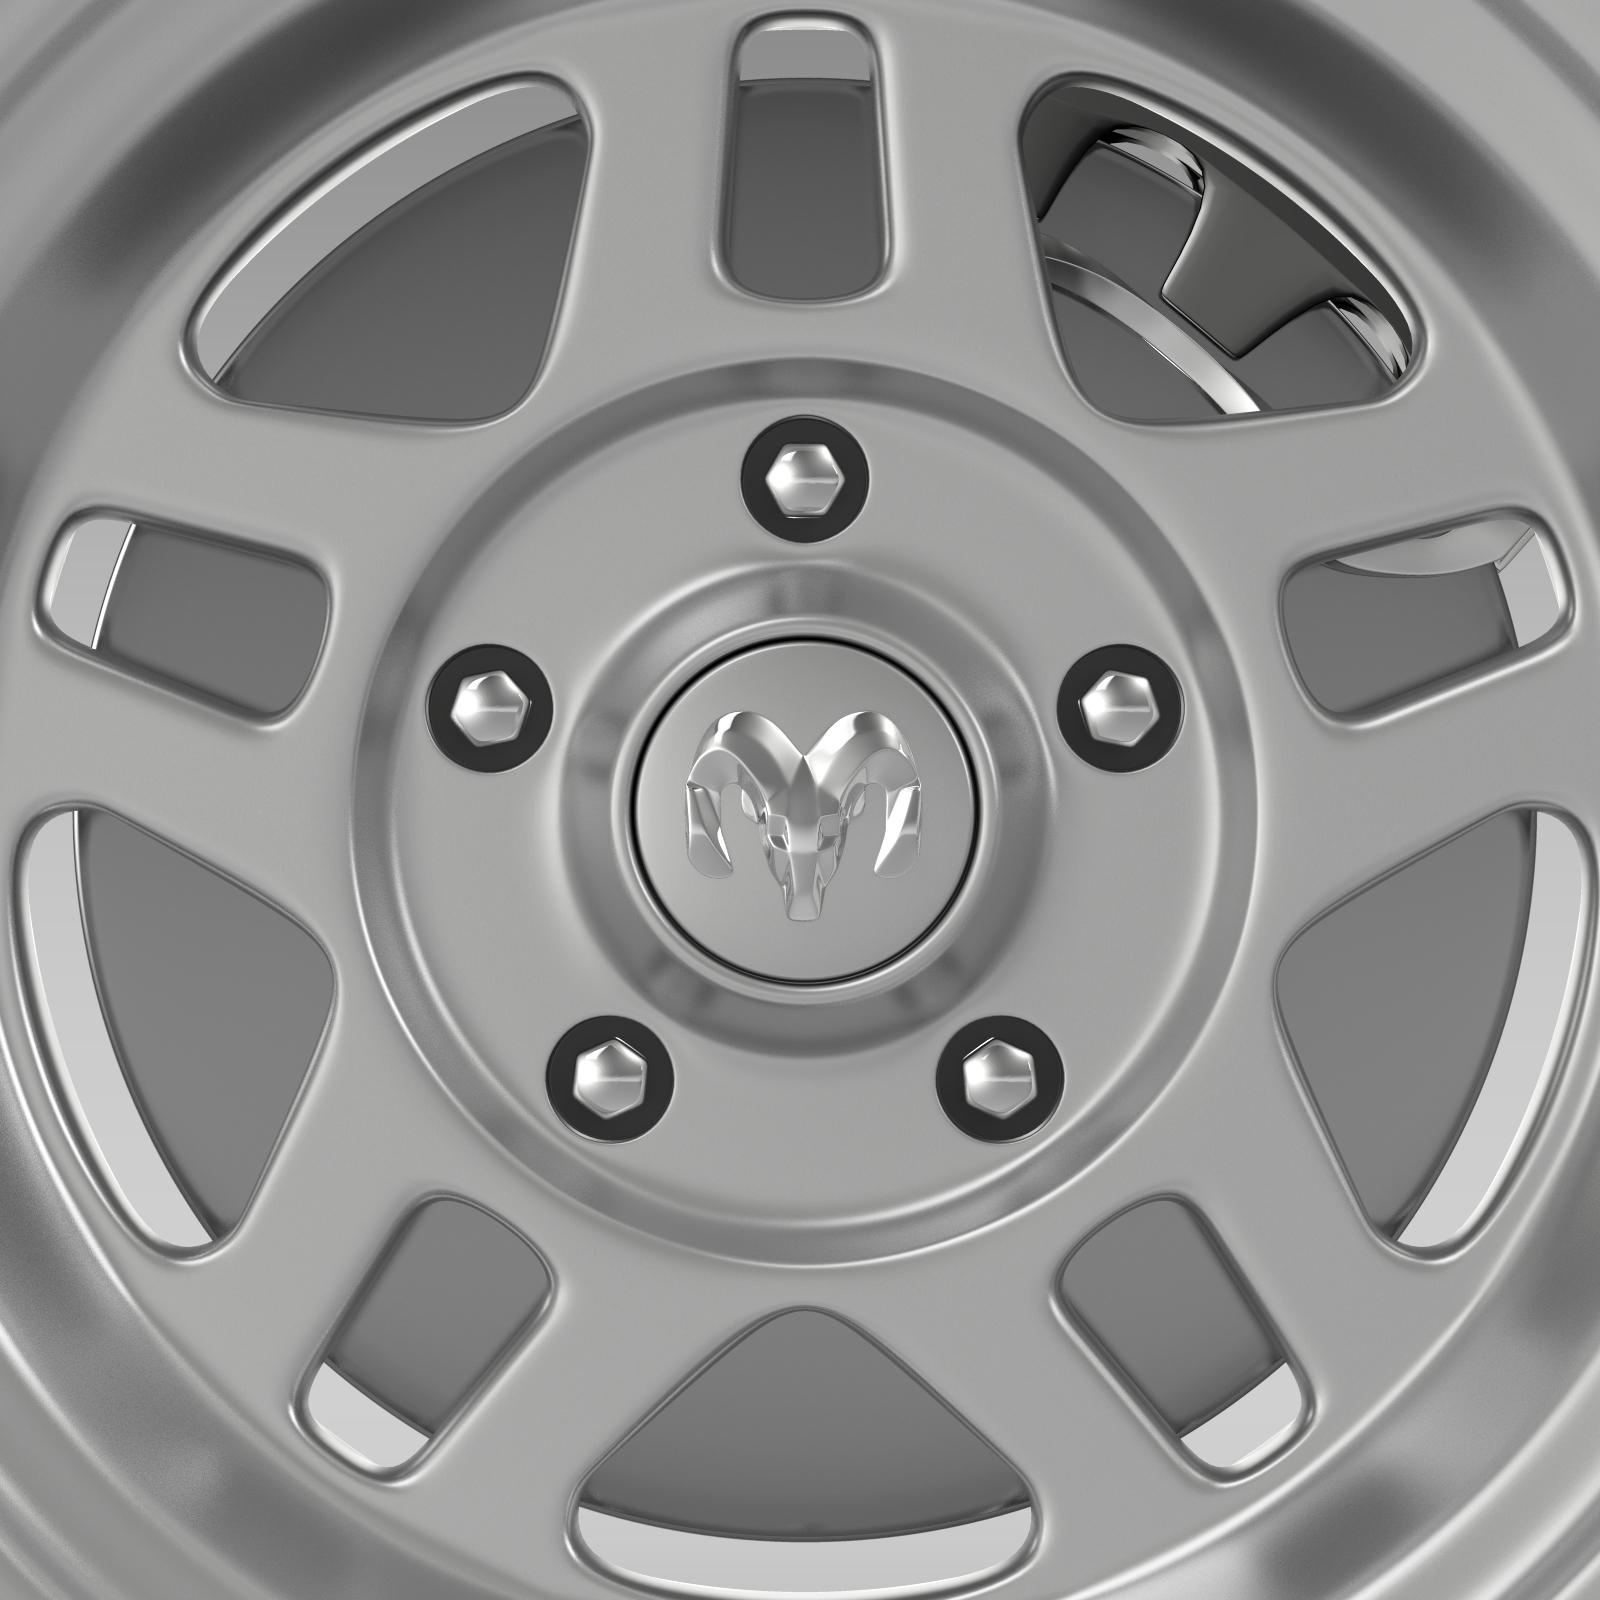 dodge challenger mopar wheel 3d model 3ds max fbx c4d lwo ma mb hrc xsi obj 212811